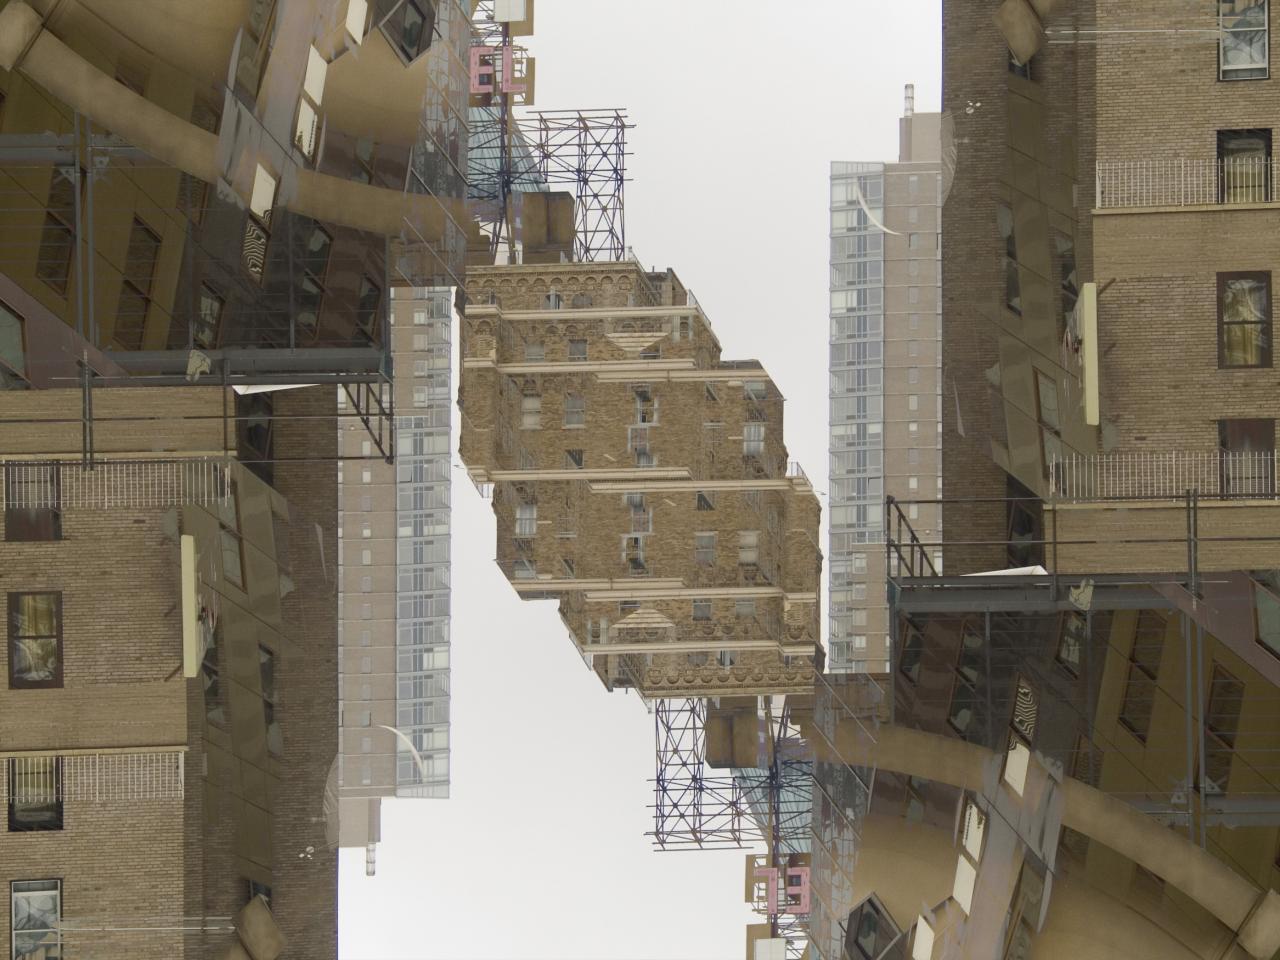 City Node, 2007, digital photograph photoshopped by Orin Buck.